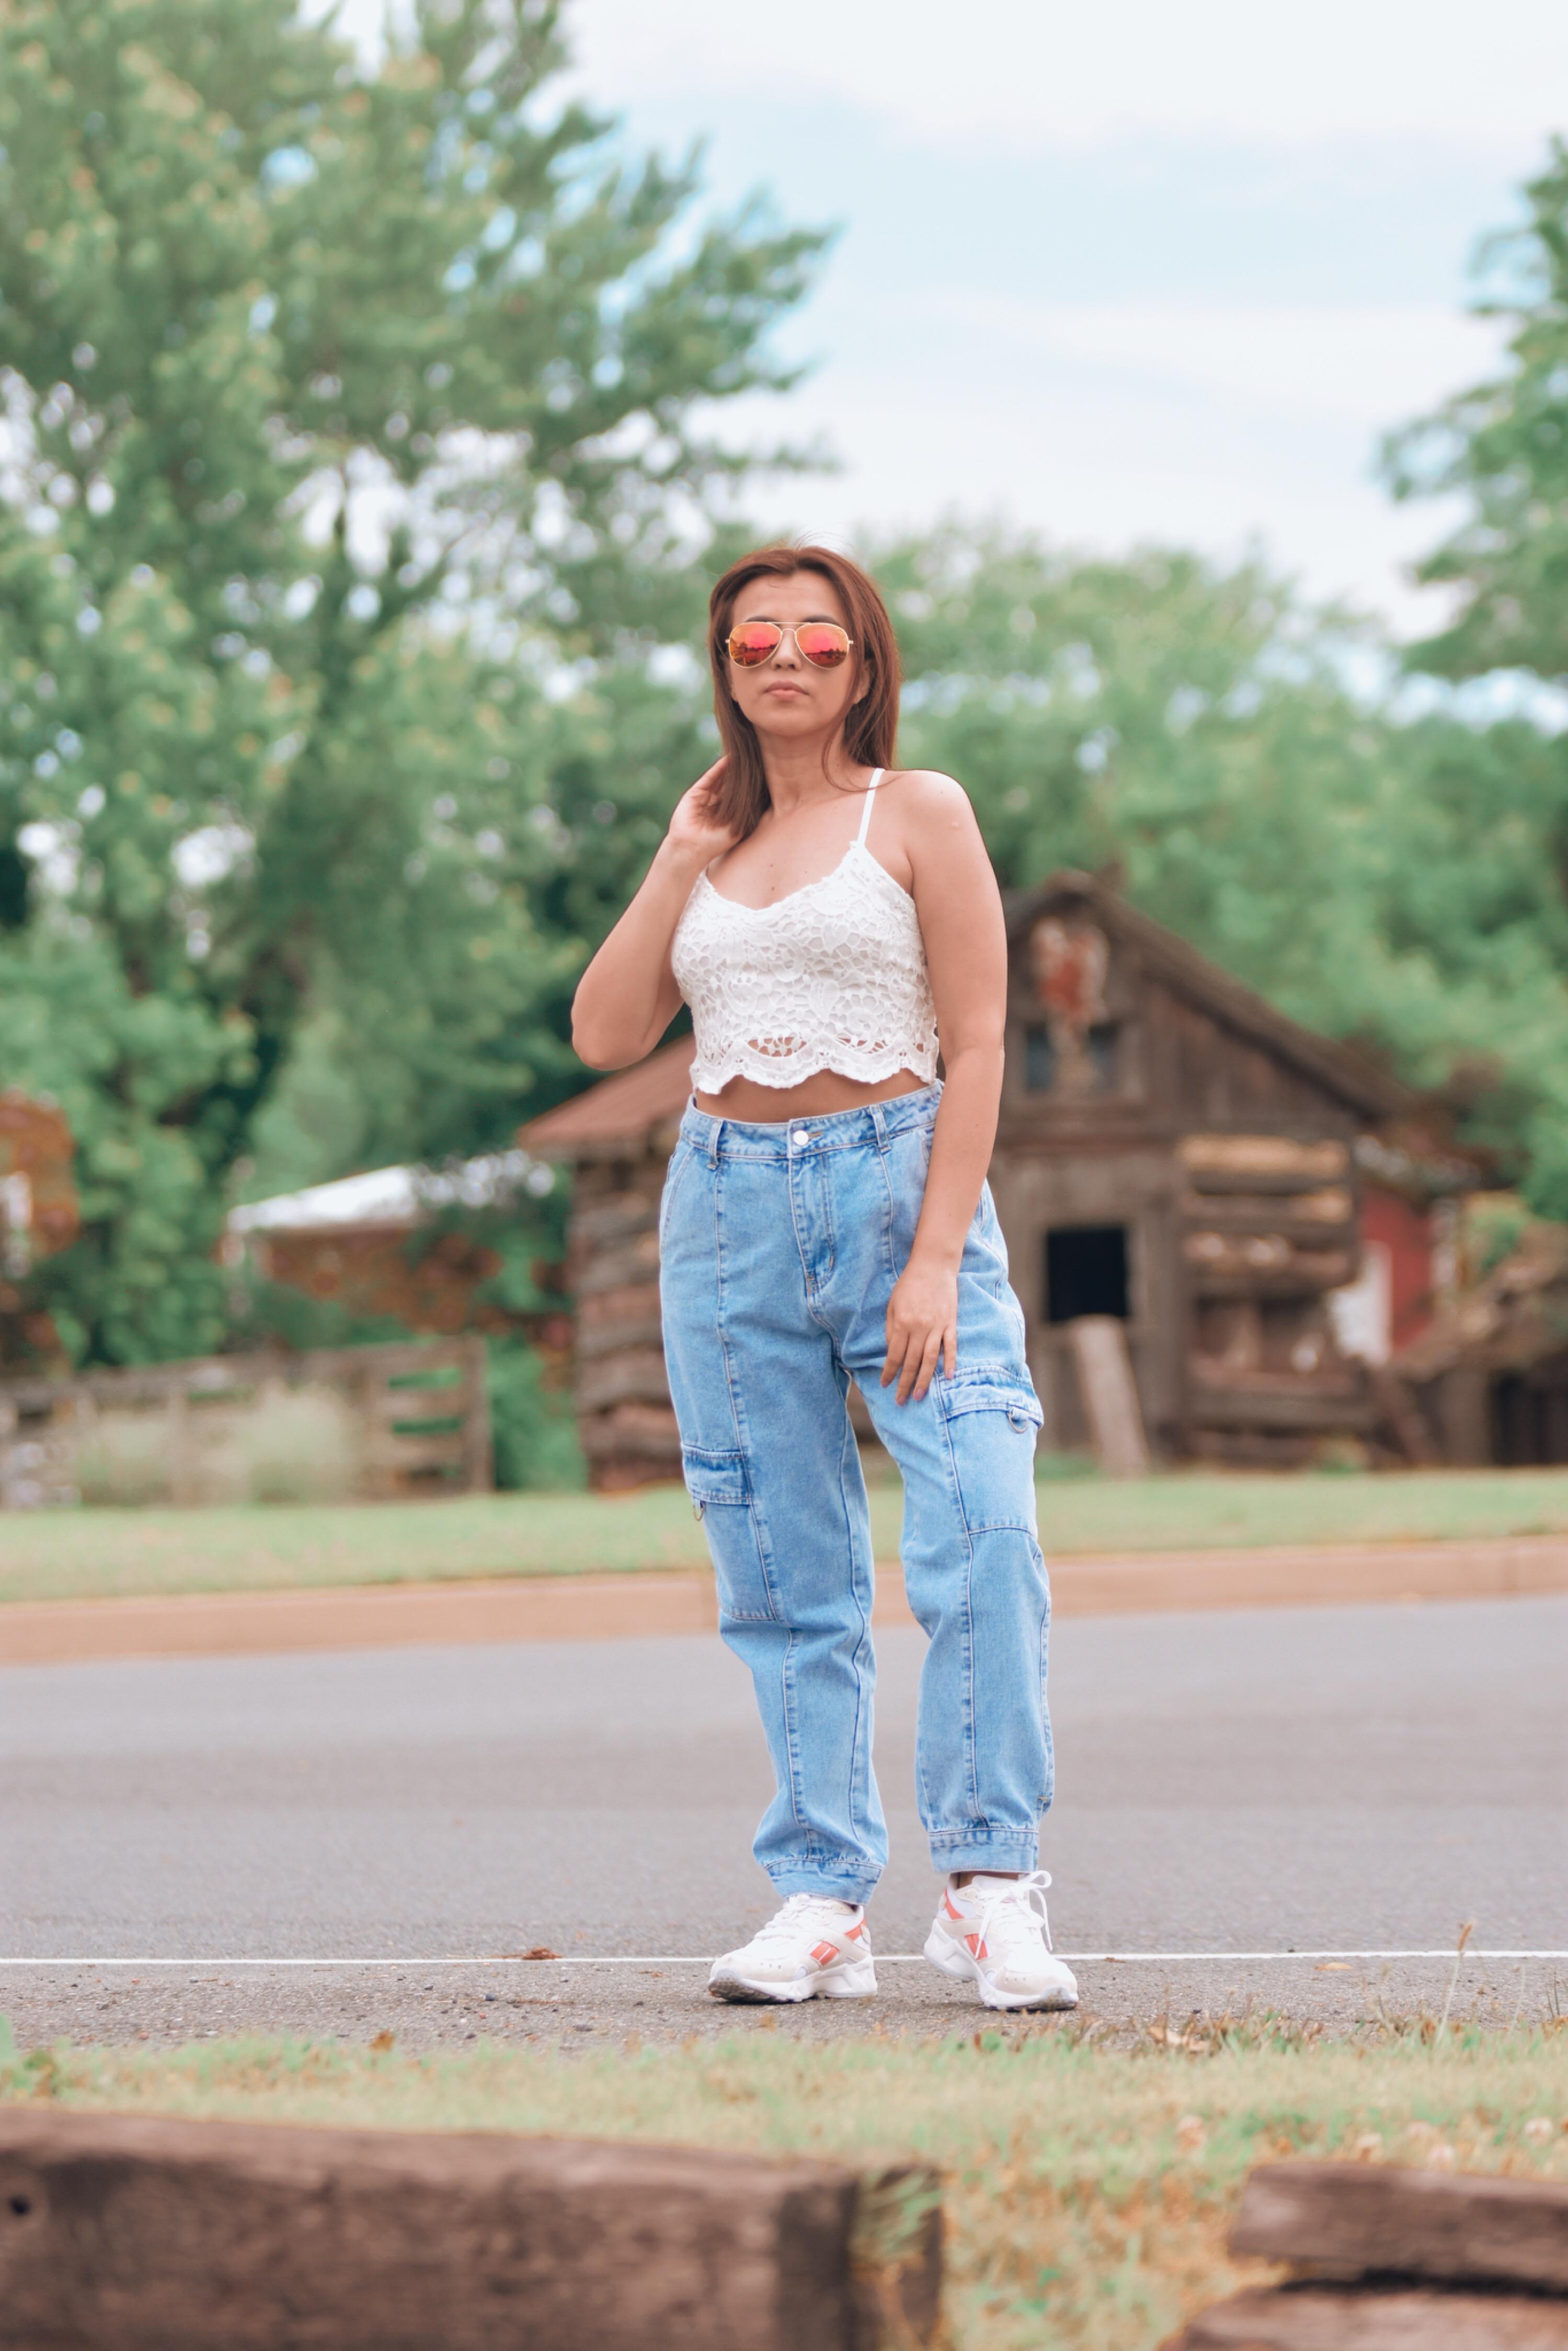 Como Combinar Unos Cargo Jeans-mariestilo-como crear outfits desde cero-cargo pants-como combinar jeans-como combinar pantalones de mezclilla-